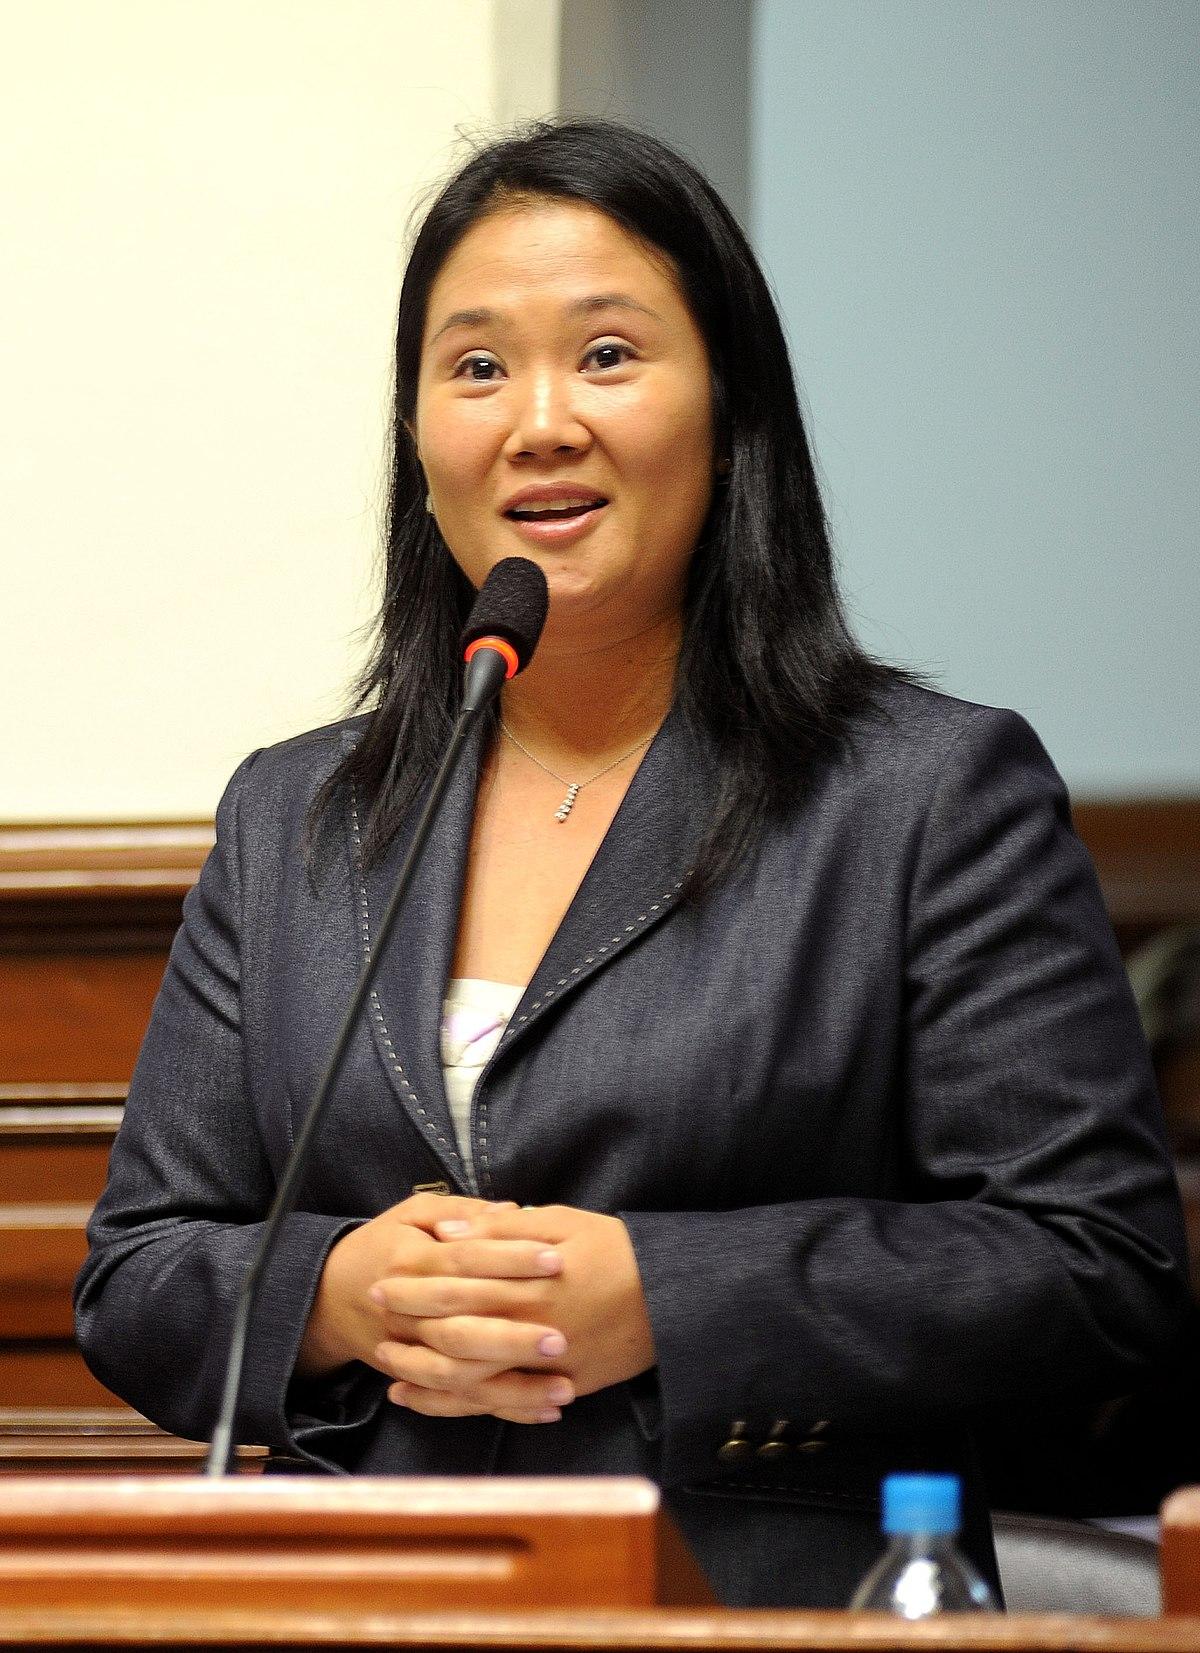 Keiko Fujimori - Wikipedia